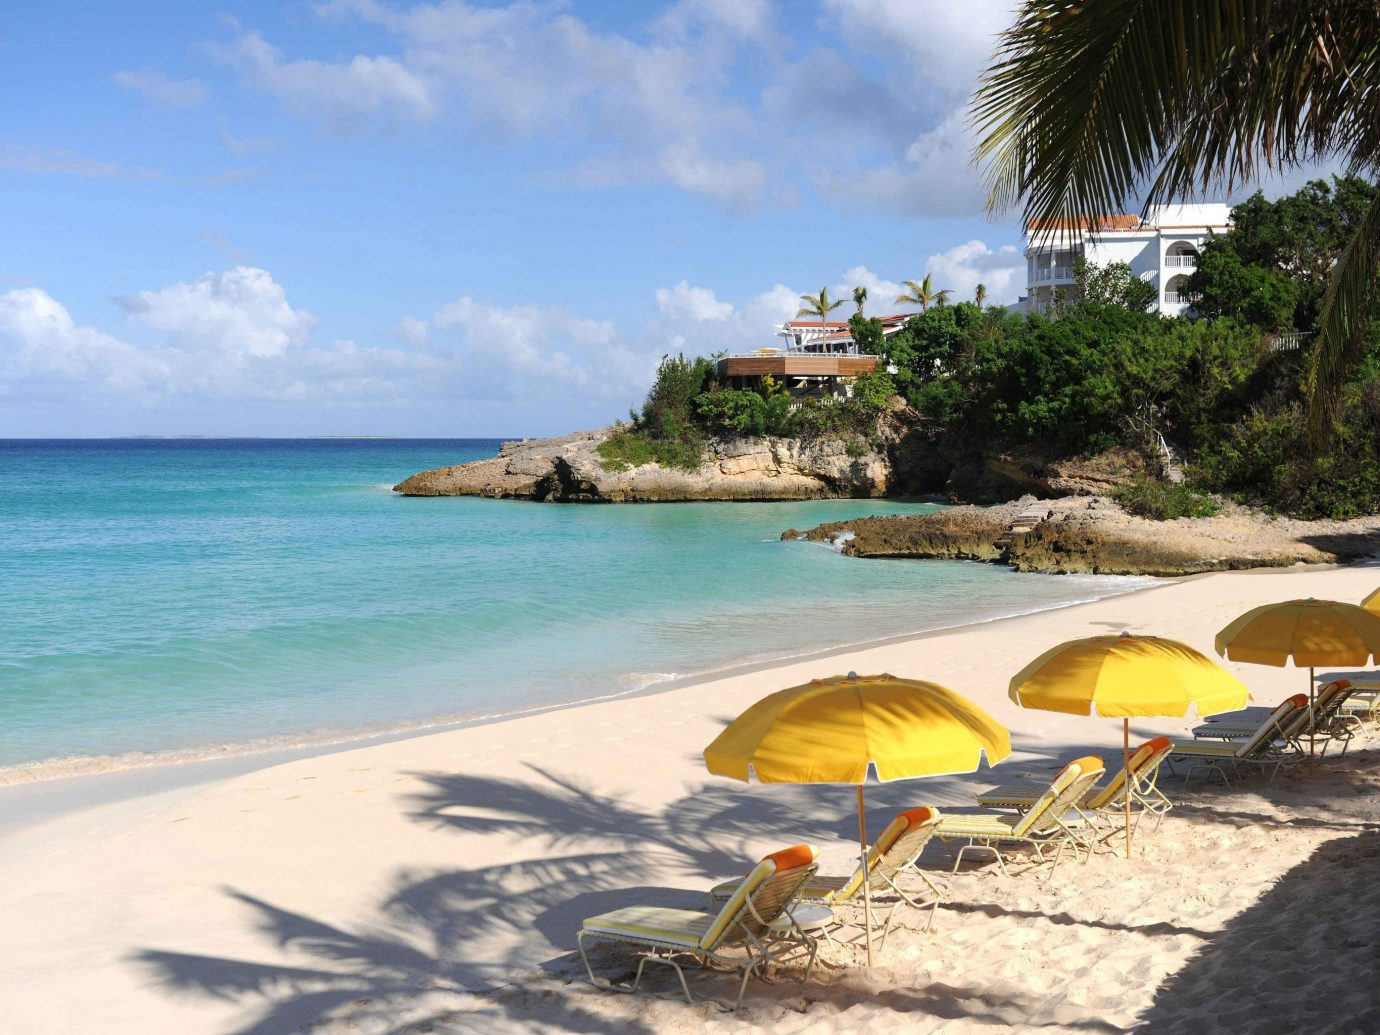 Trip Ideas outdoor water sky Beach umbrella chair shore Sea lawn body of water Nature vacation caribbean Ocean Coast lined bay tropics Resort Island sand cape Lagoon cove palm sandy swimming line